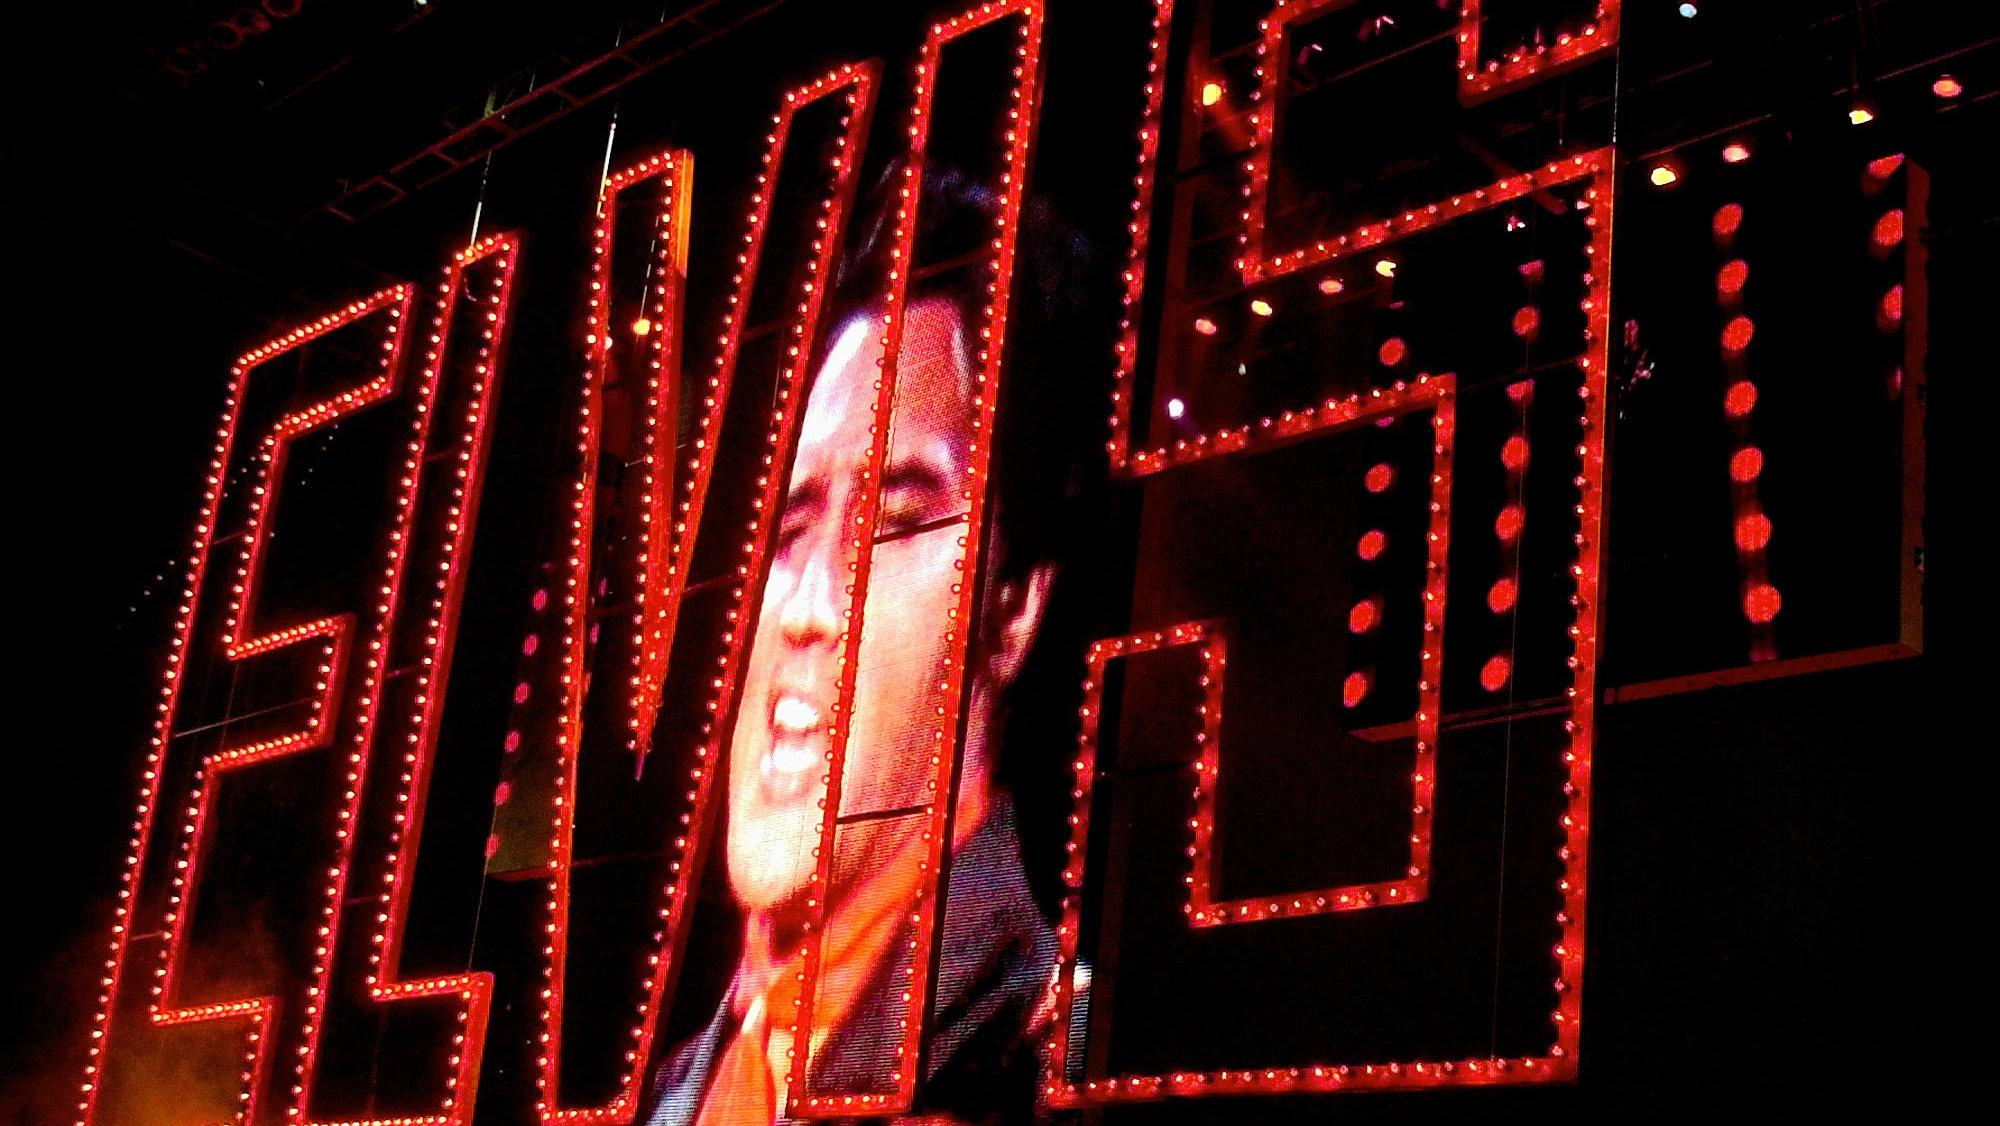 Video of Elvis Presley singing as his band plays below at the start of the Elvis Presley 25th Anniversary Concert in Memphis, Tenn.